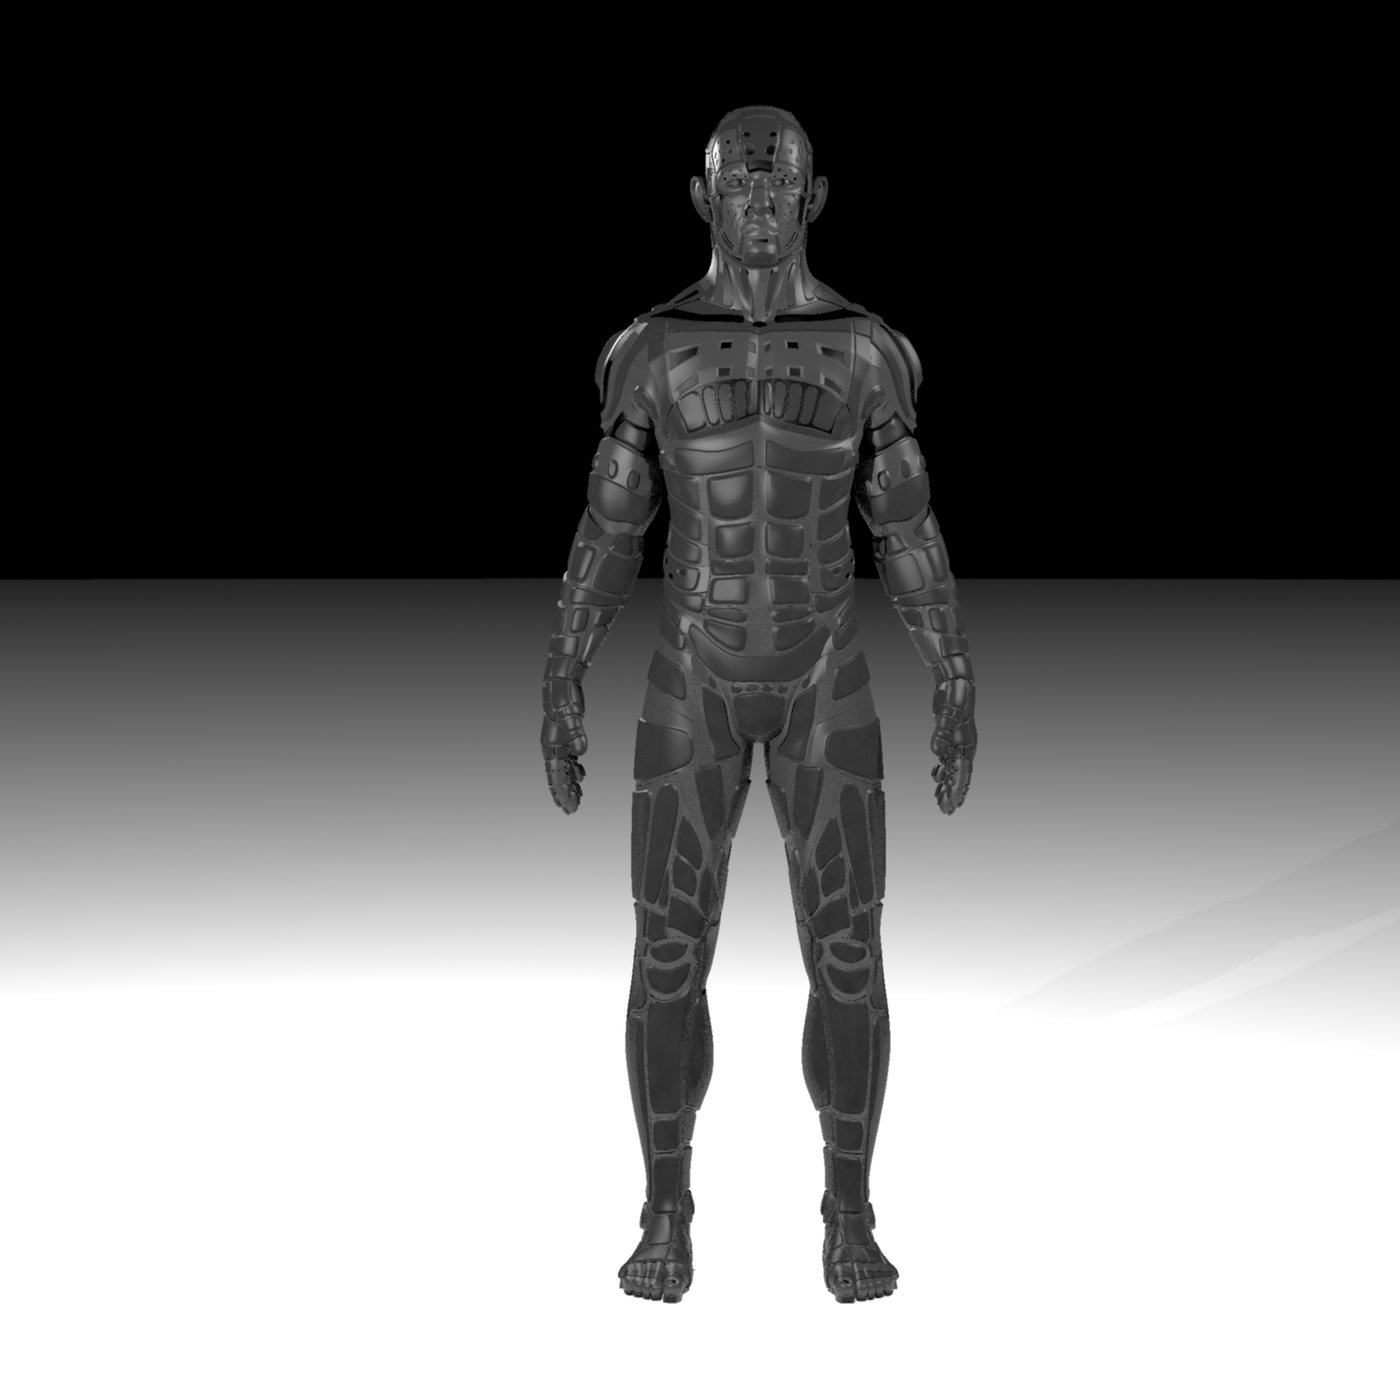 Male Robot 02 - MR02